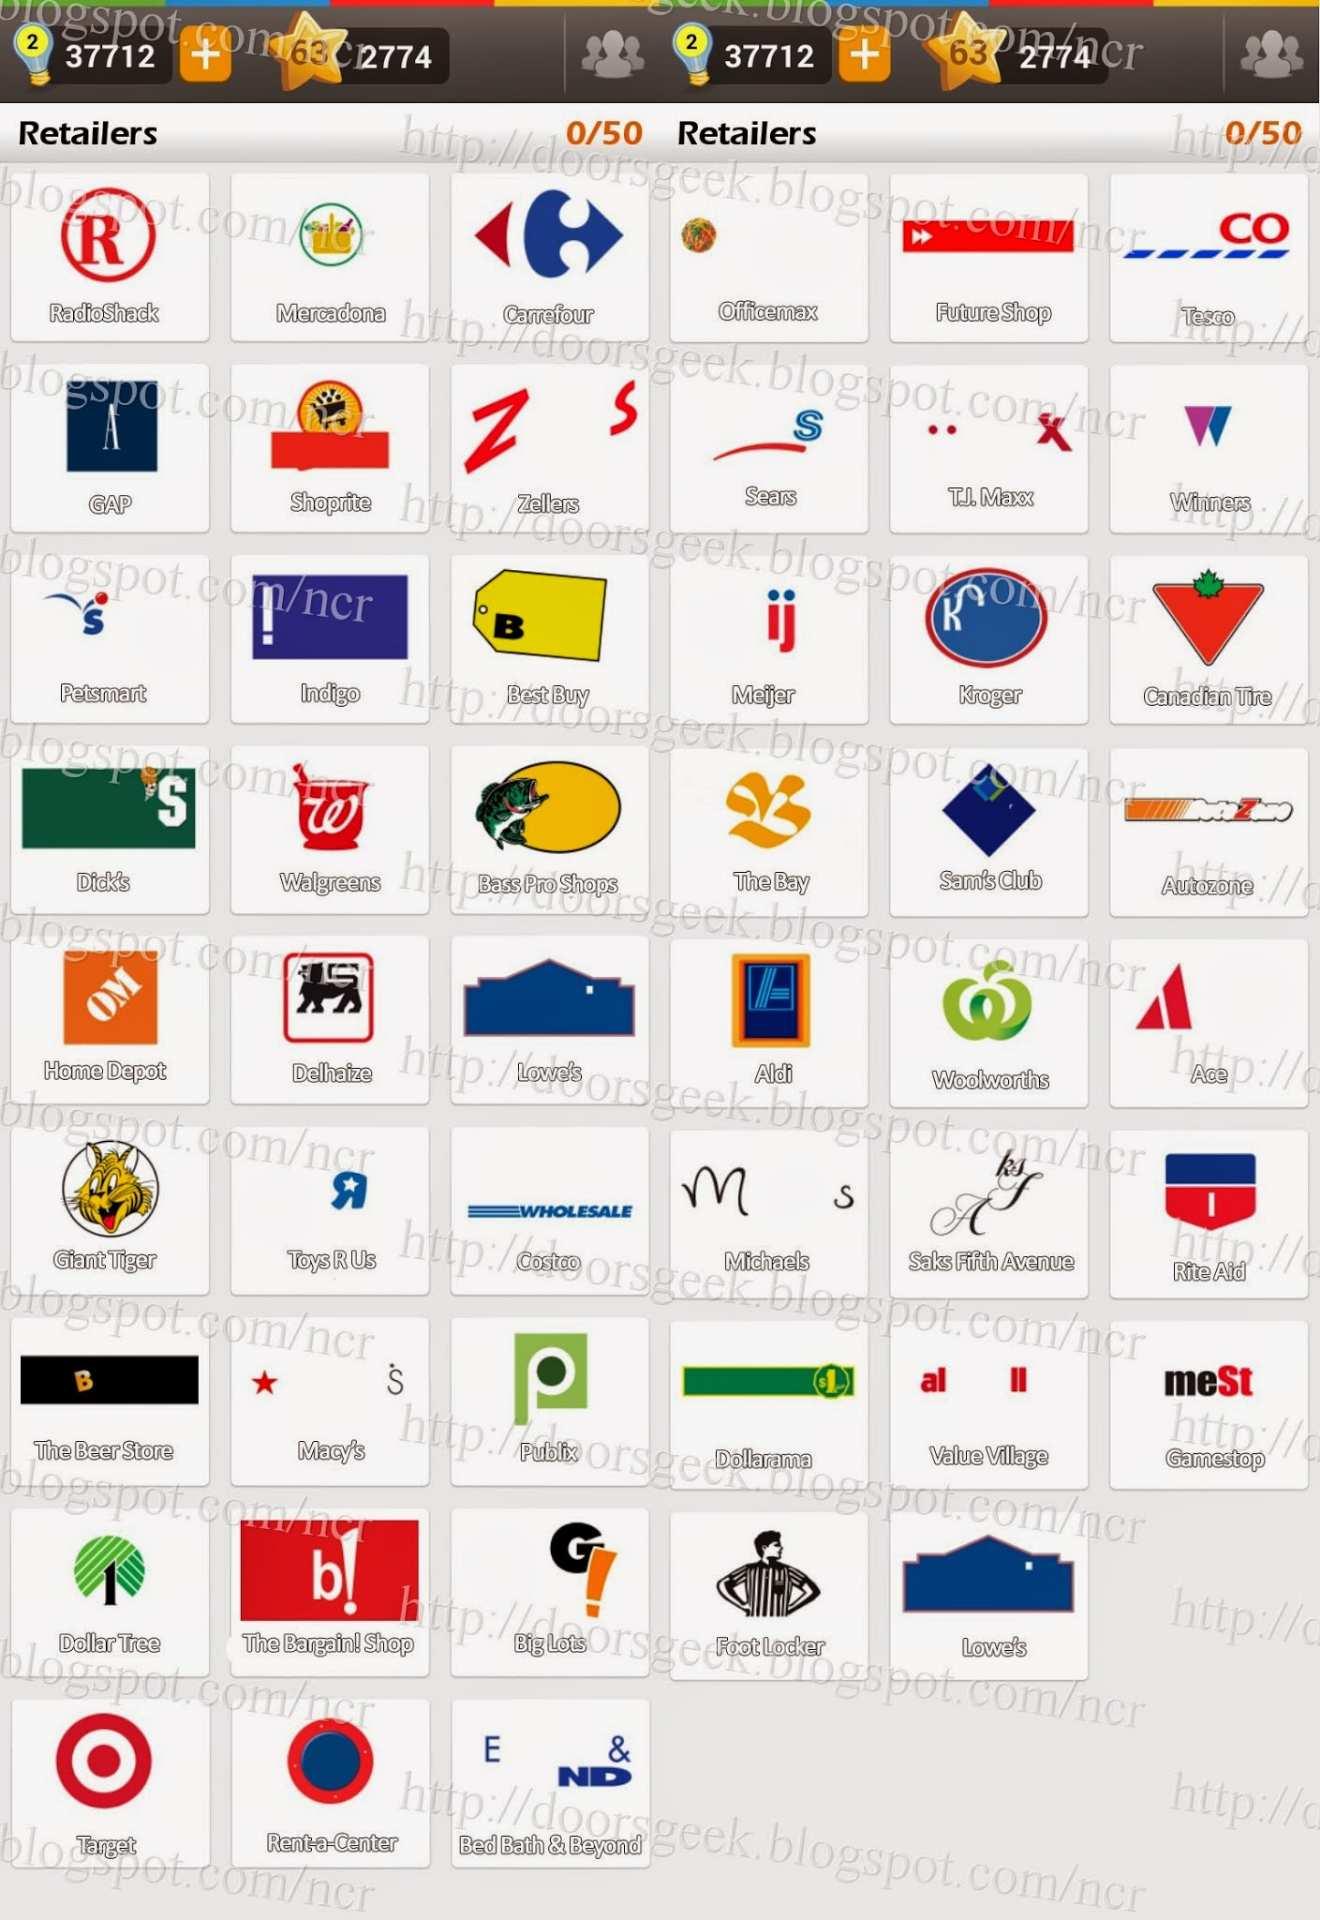 Retail logo quiz flashcards on Tinycards.